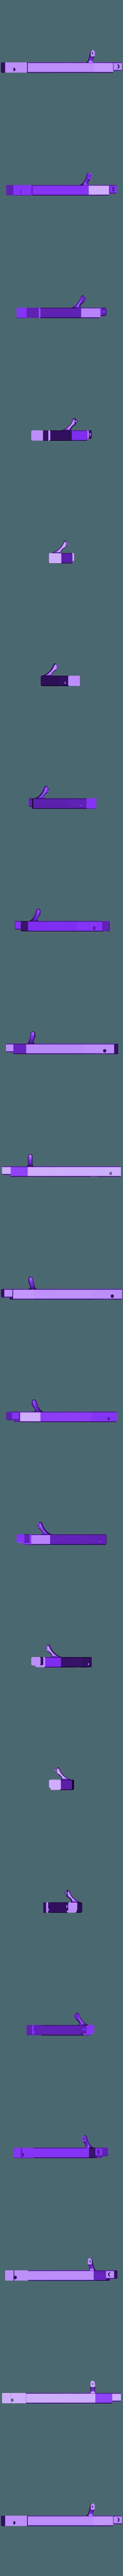 09TRK-RHS-FR-LOW.stl Download STL file Ratrod Pickup • 3D printing template, macone1